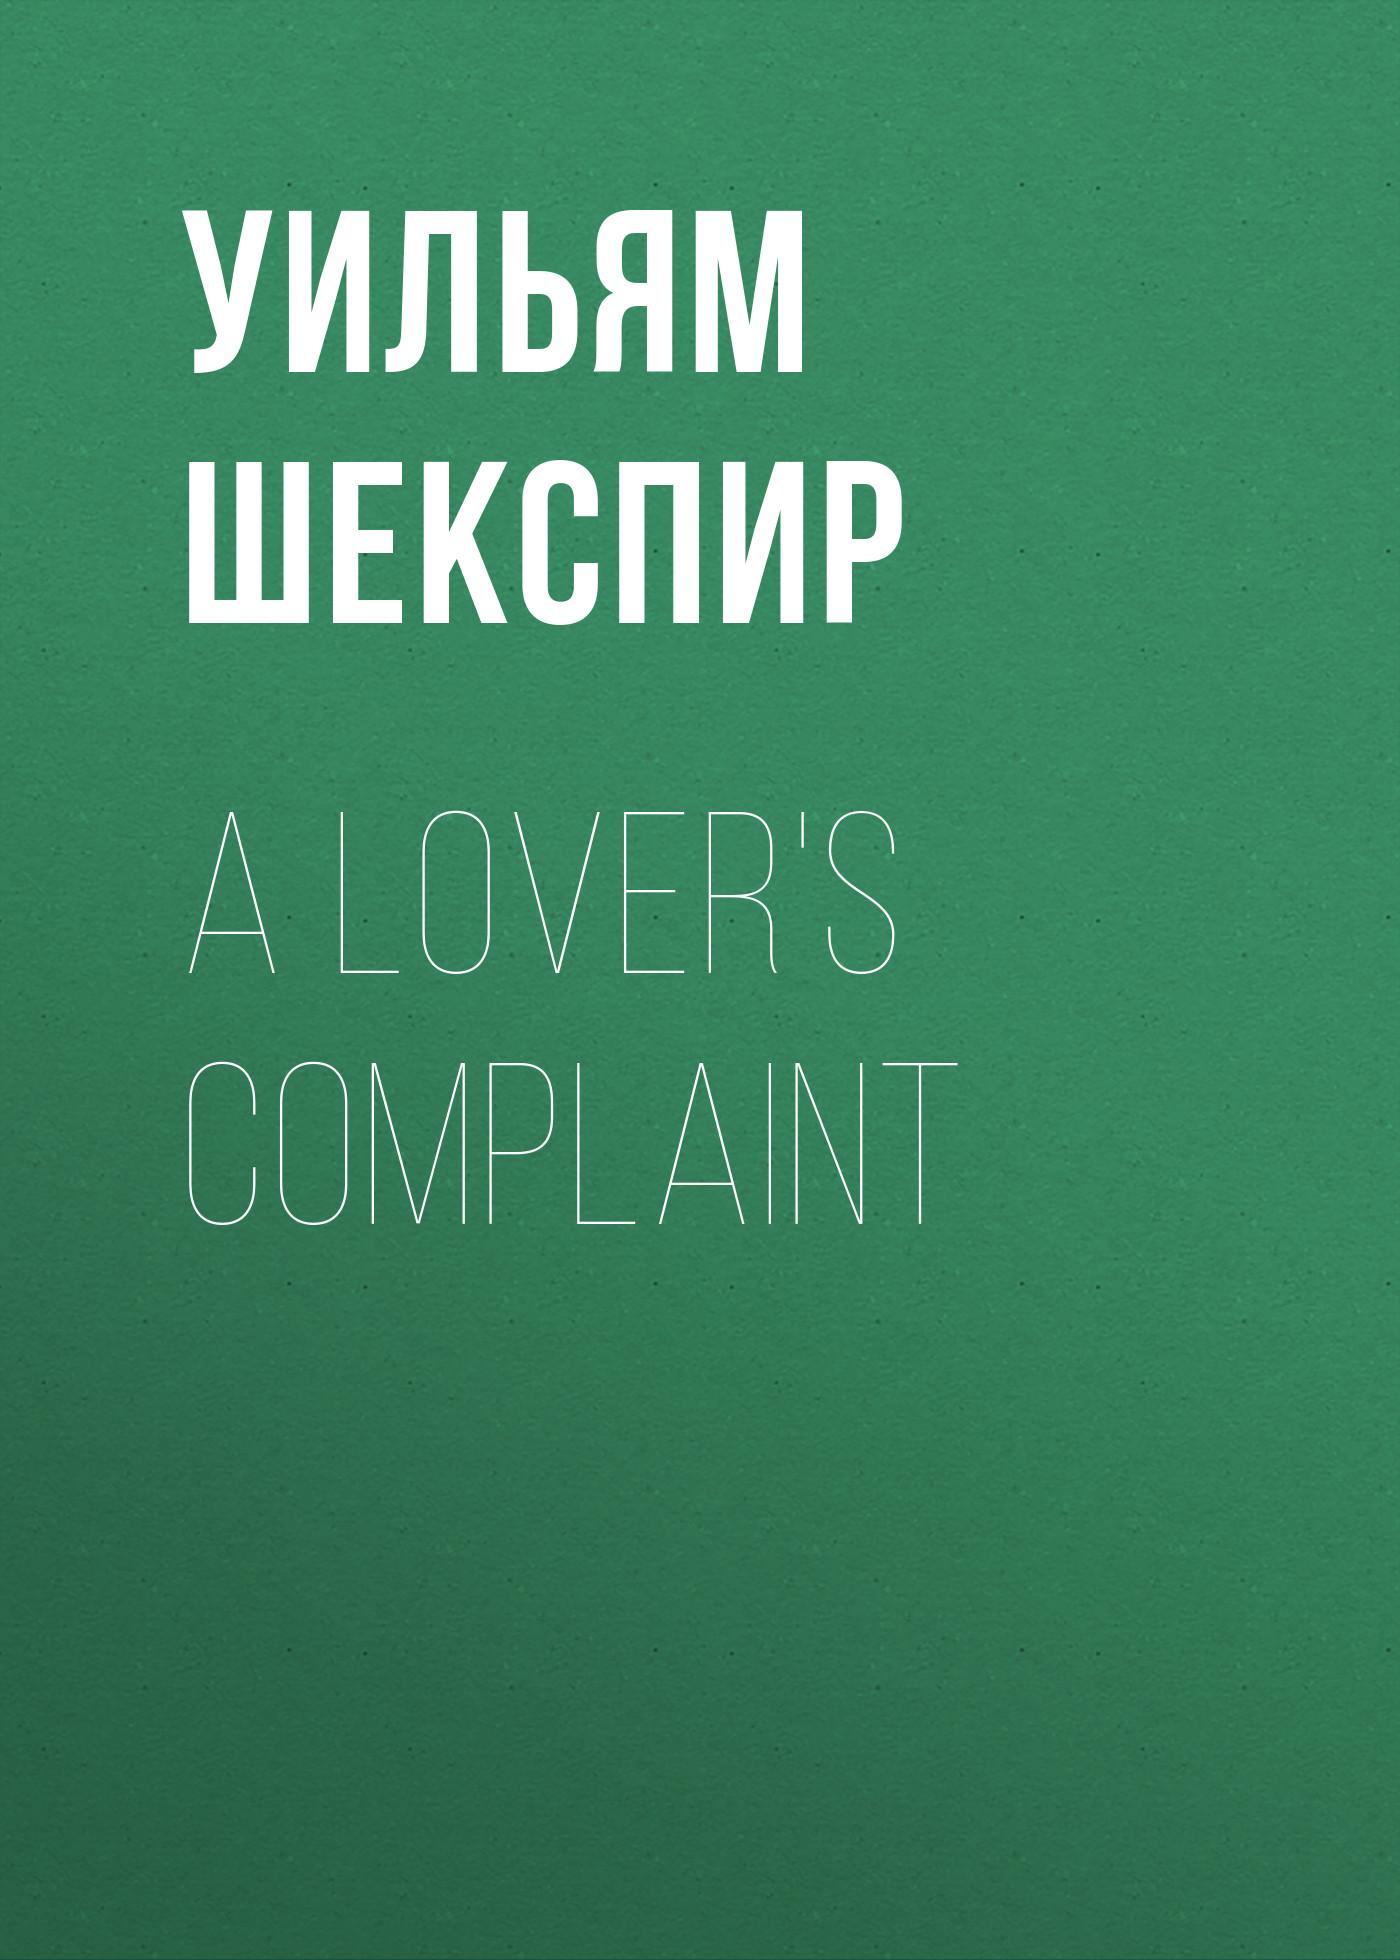 Уильям Шекспир A Lover's Complaint eugenides j fresh complaint